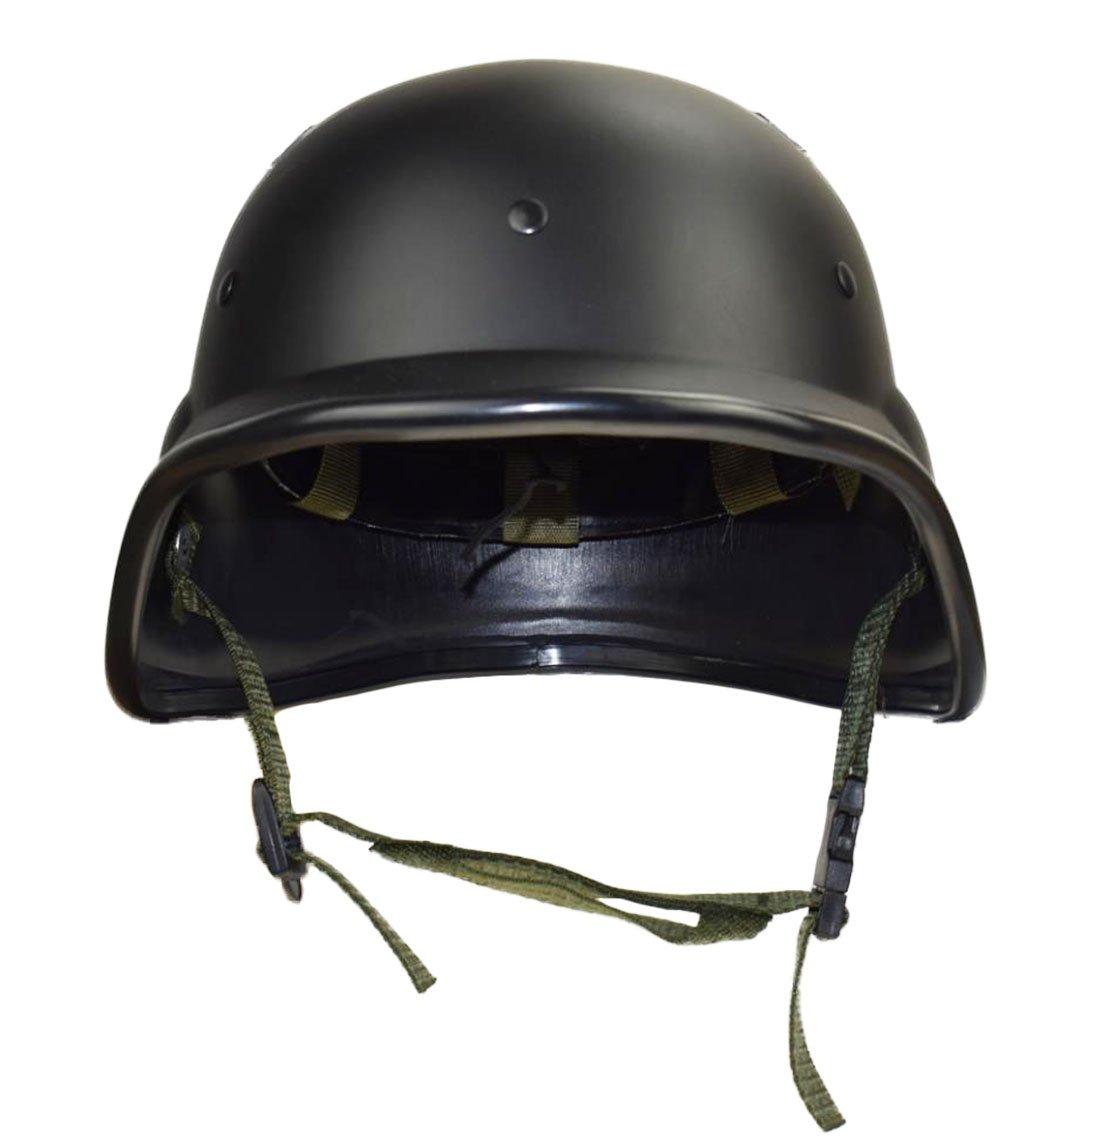 Amazon.com: jadedragon táctica M88 casco de ABS: Sports ...